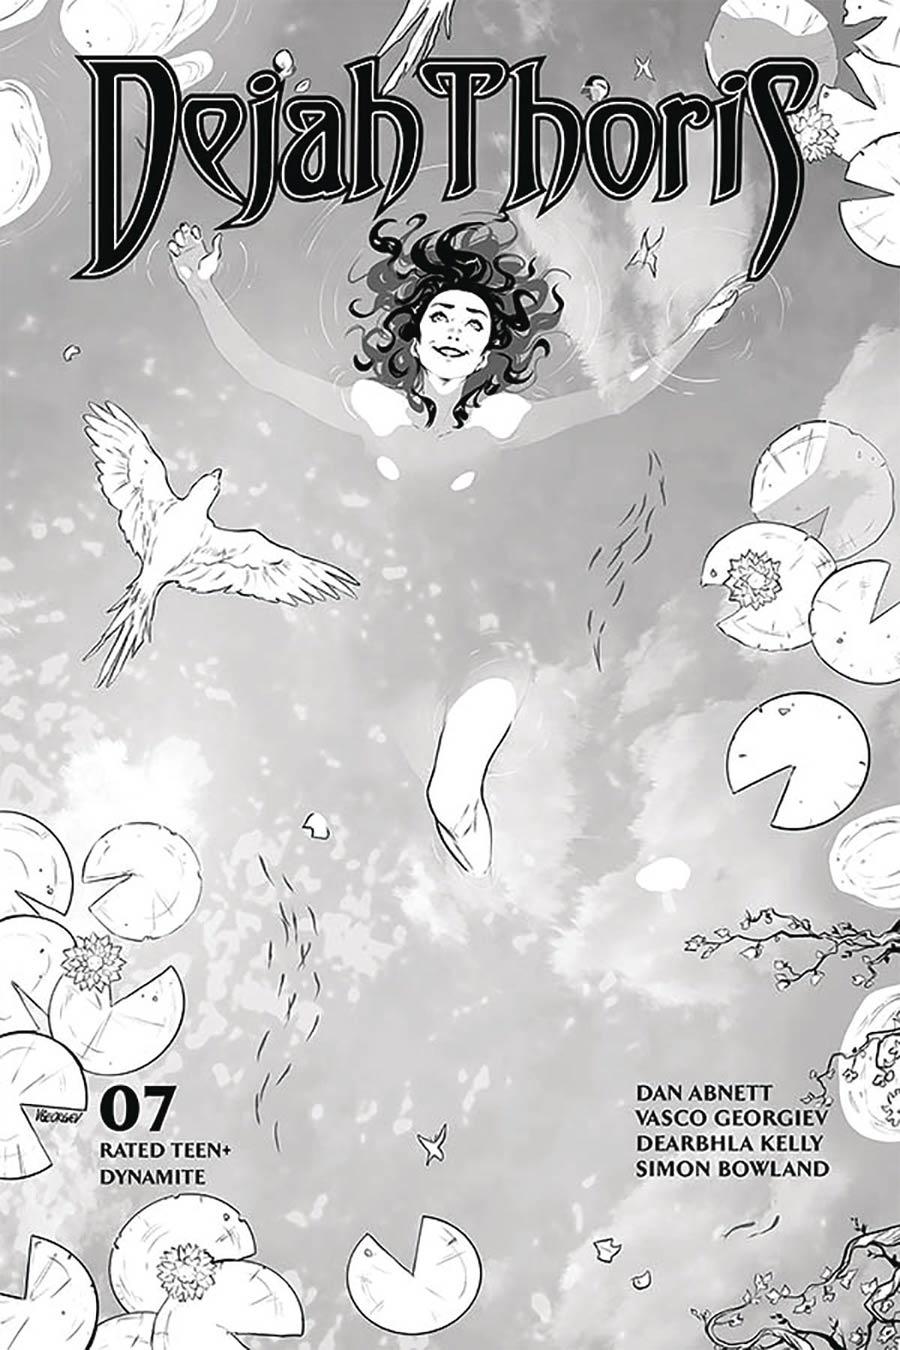 Dejah Thoris Vol 3 #7 Cover N Incentive Vasco Georgiev Black & White Cover